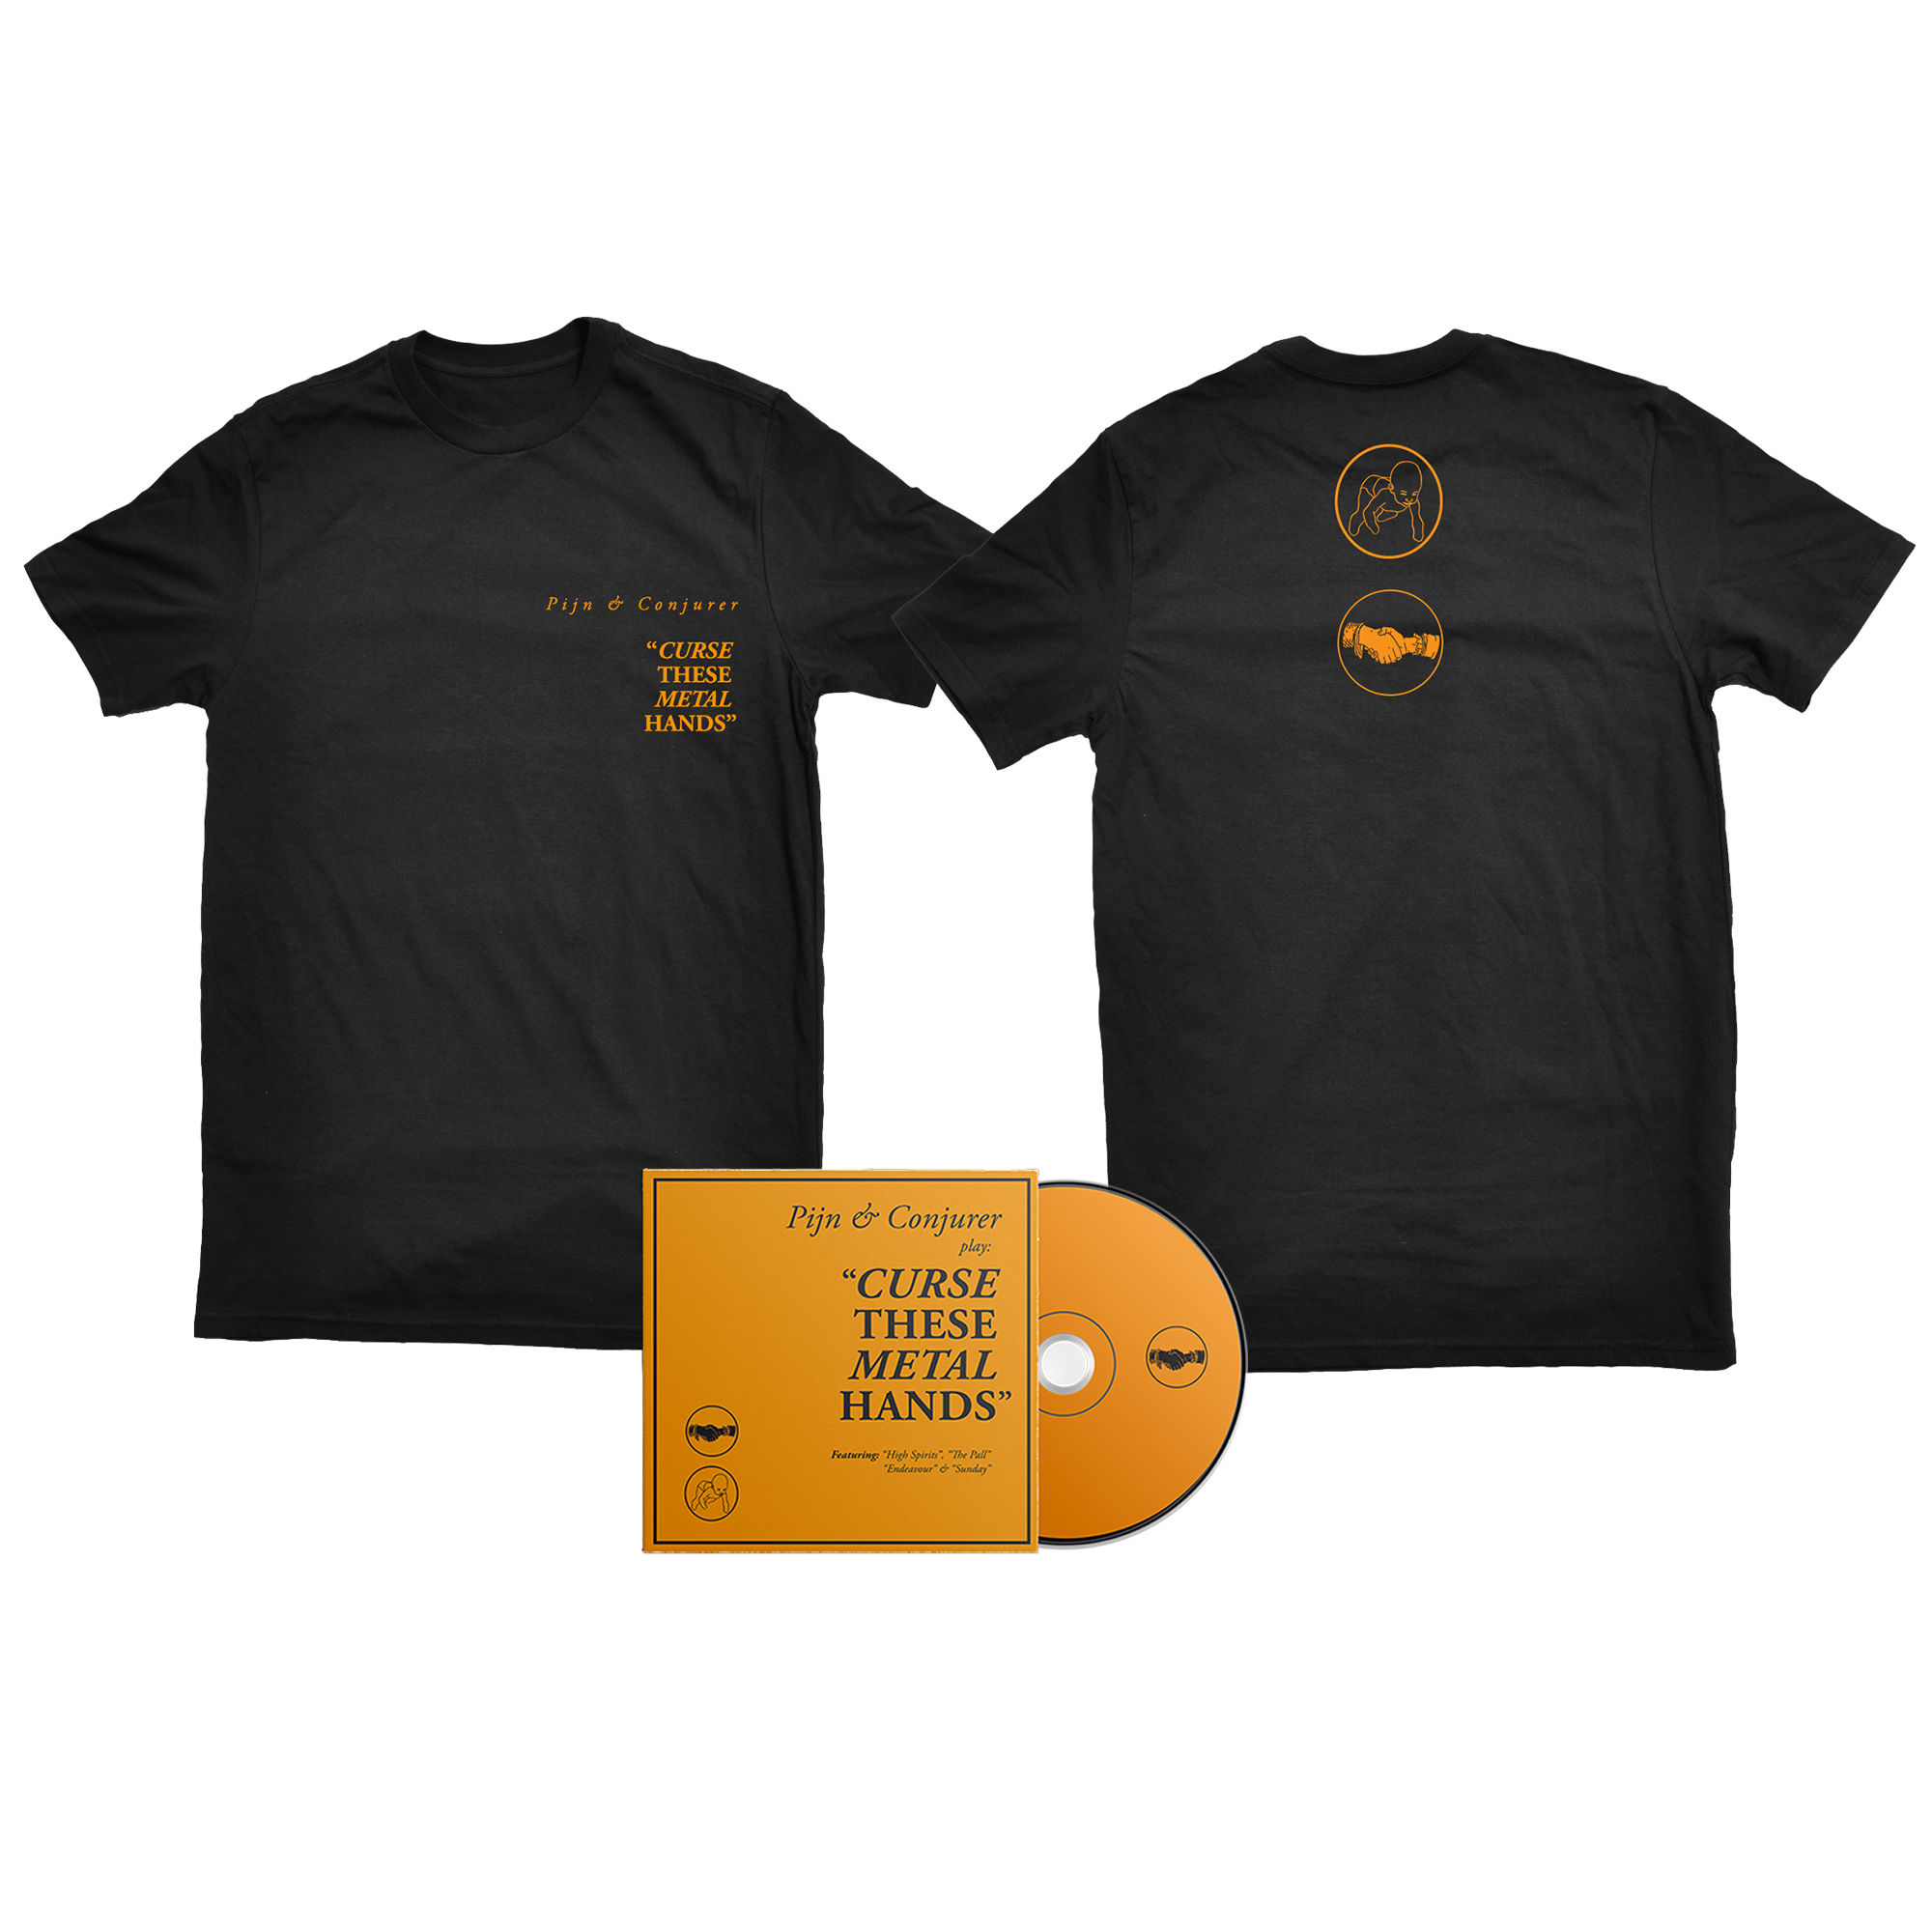 Pijn & Conjurer - Curse These Metal Hands handshake shirt + CD